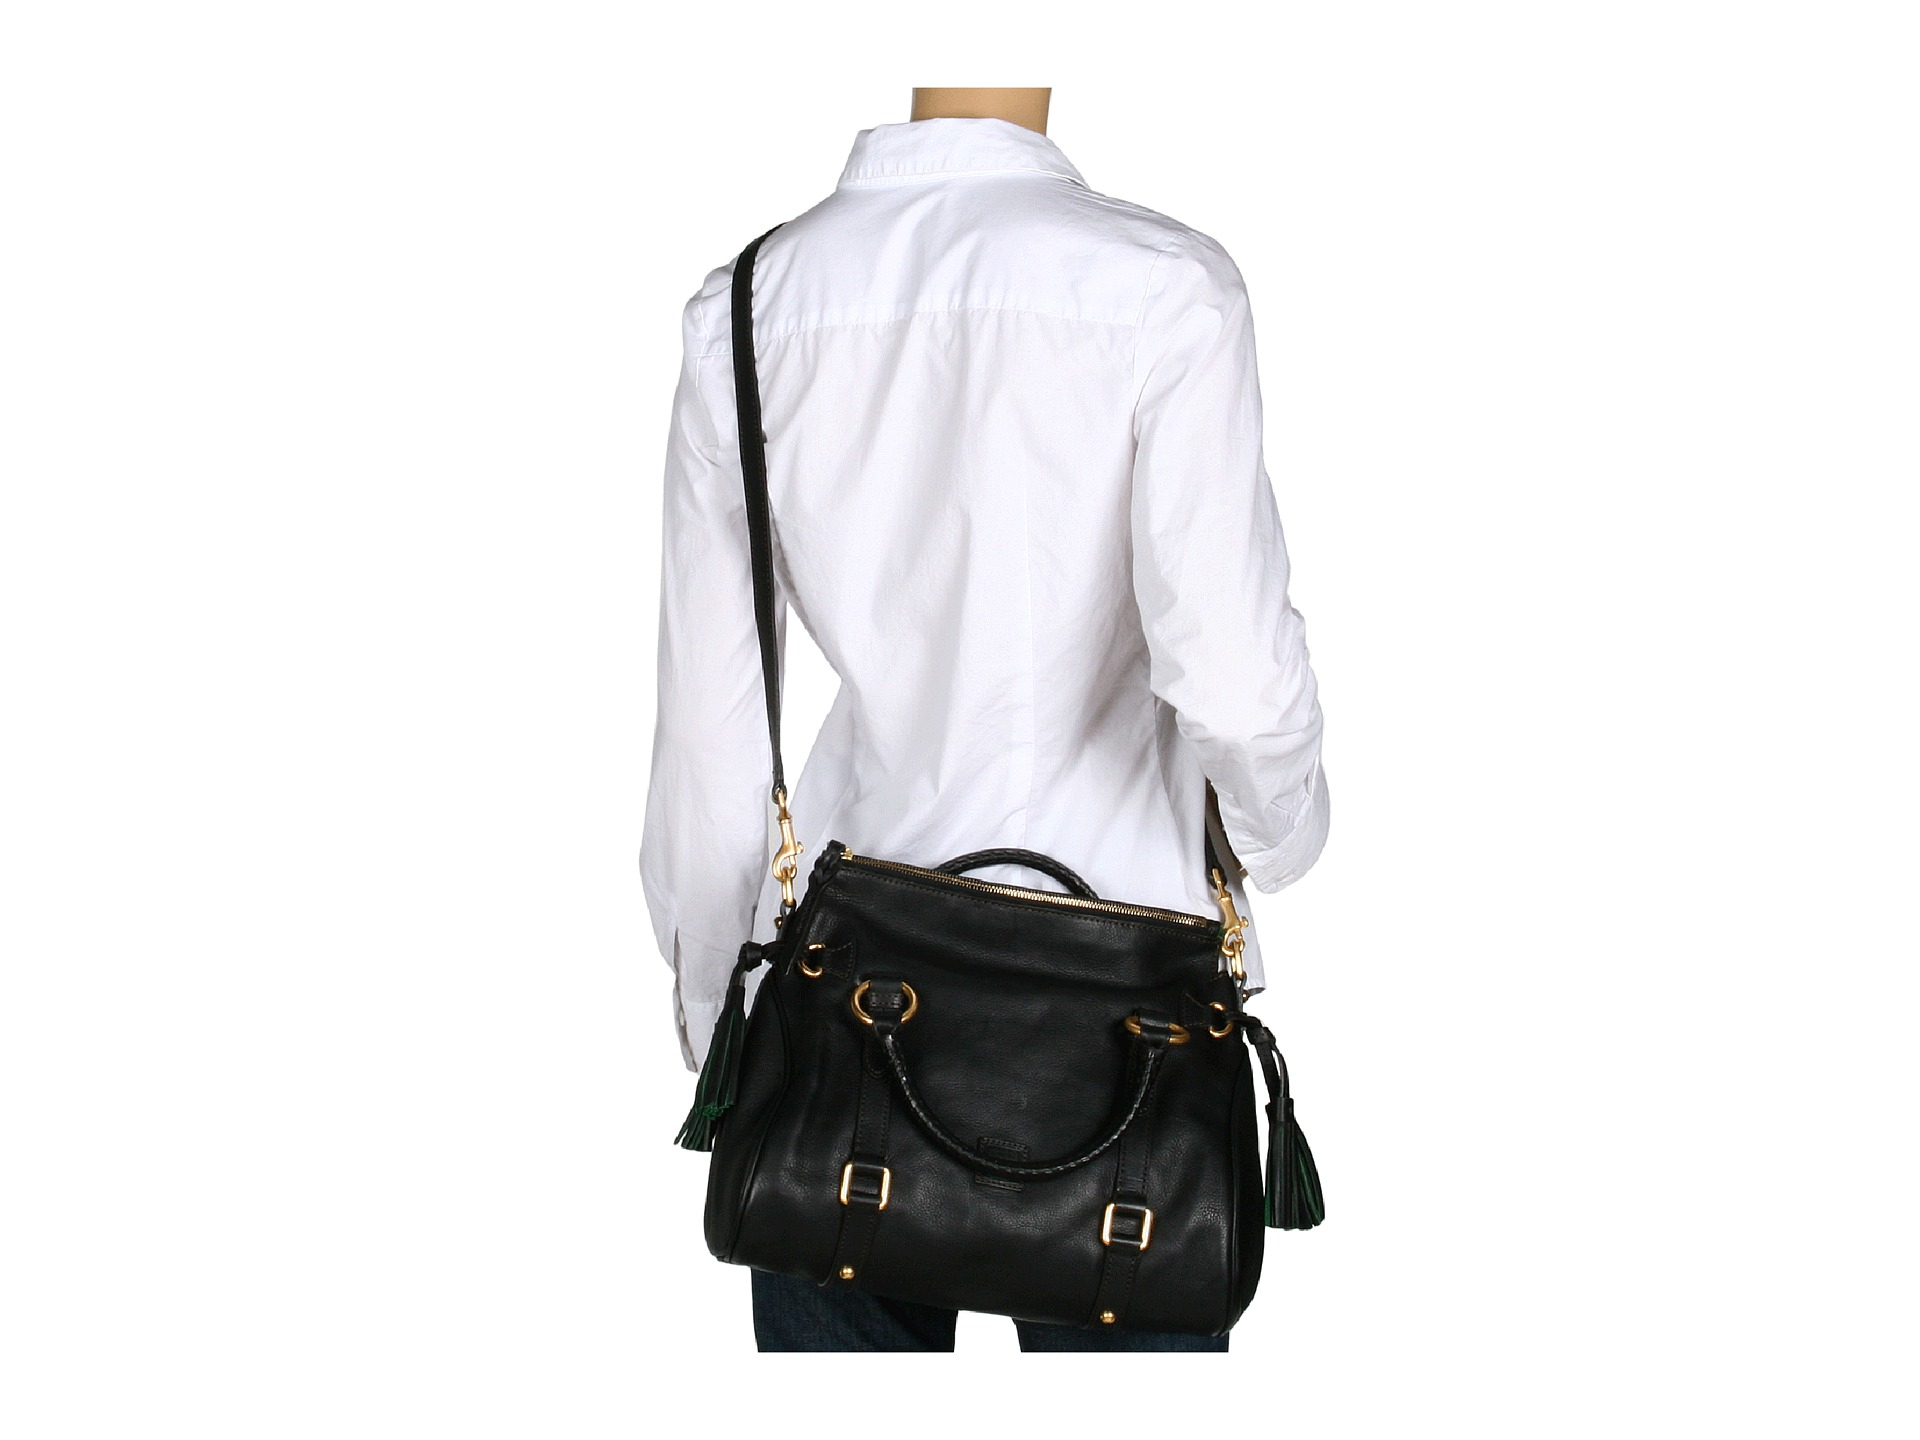 0dc7c1c11f3 Lyst - Dooney   Bourke Florentine Mini Leather Satchel in Black